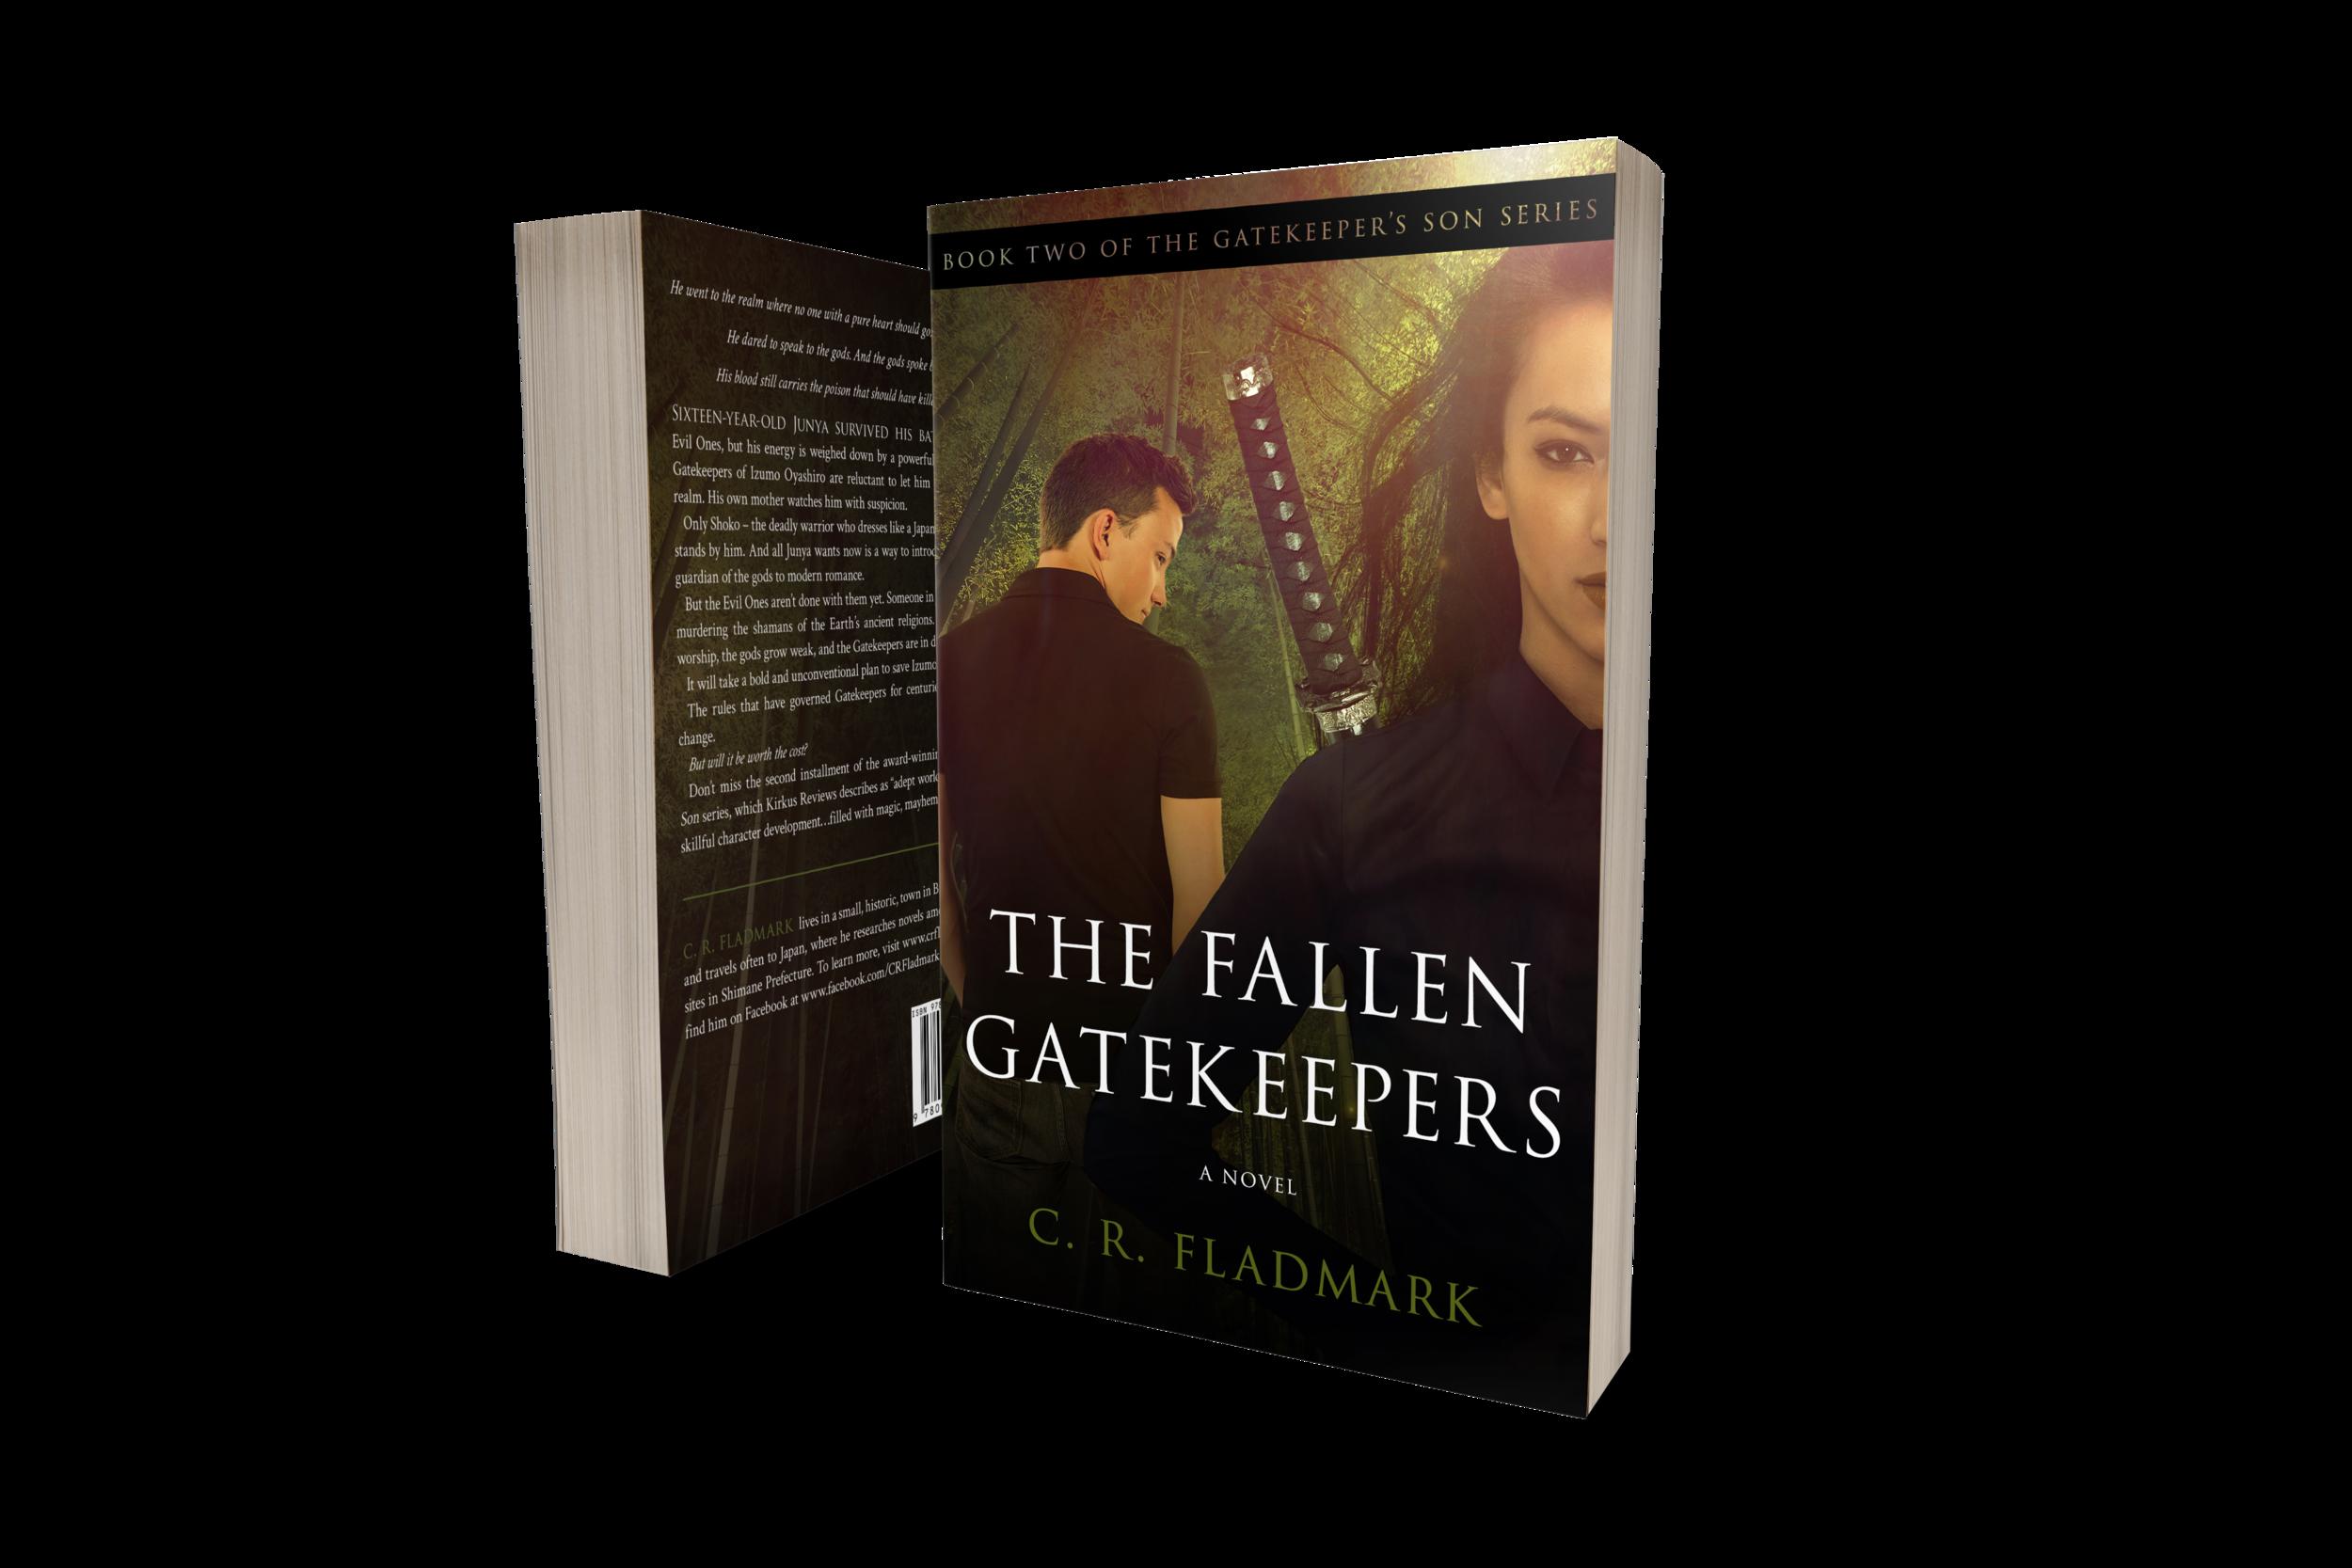 C. R. Fladmark's The Fallen Gatekeepers    Designed by TheThatchery.com